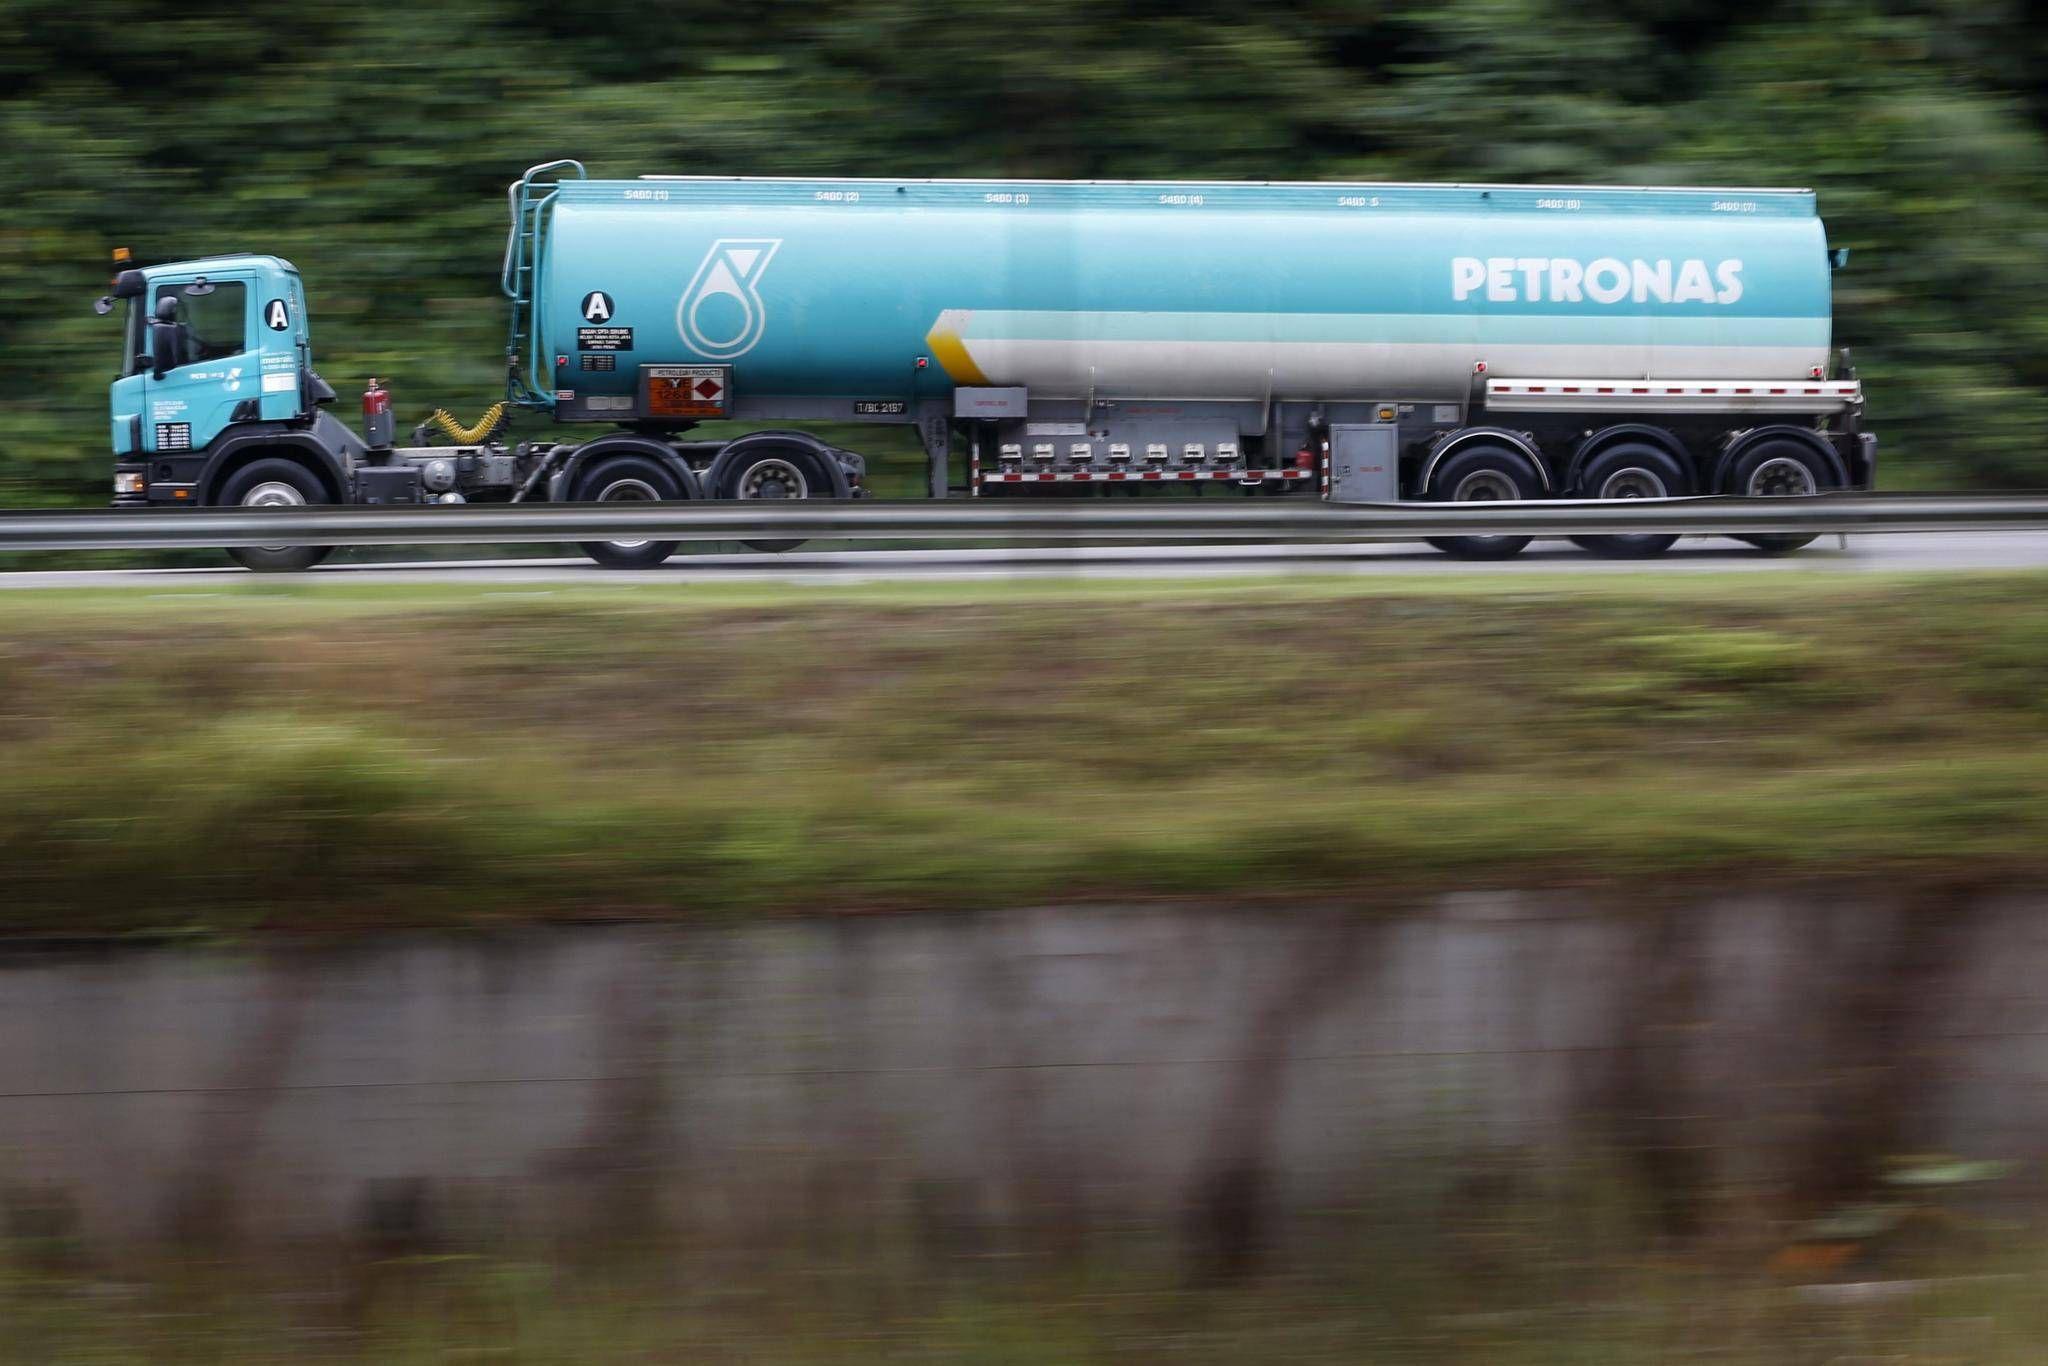 Petronas posts 96 per cent profit drop on lower oil price the petronas posts 96 per cent profit drop on lower oil price the globe and mail buycottarizona Gallery